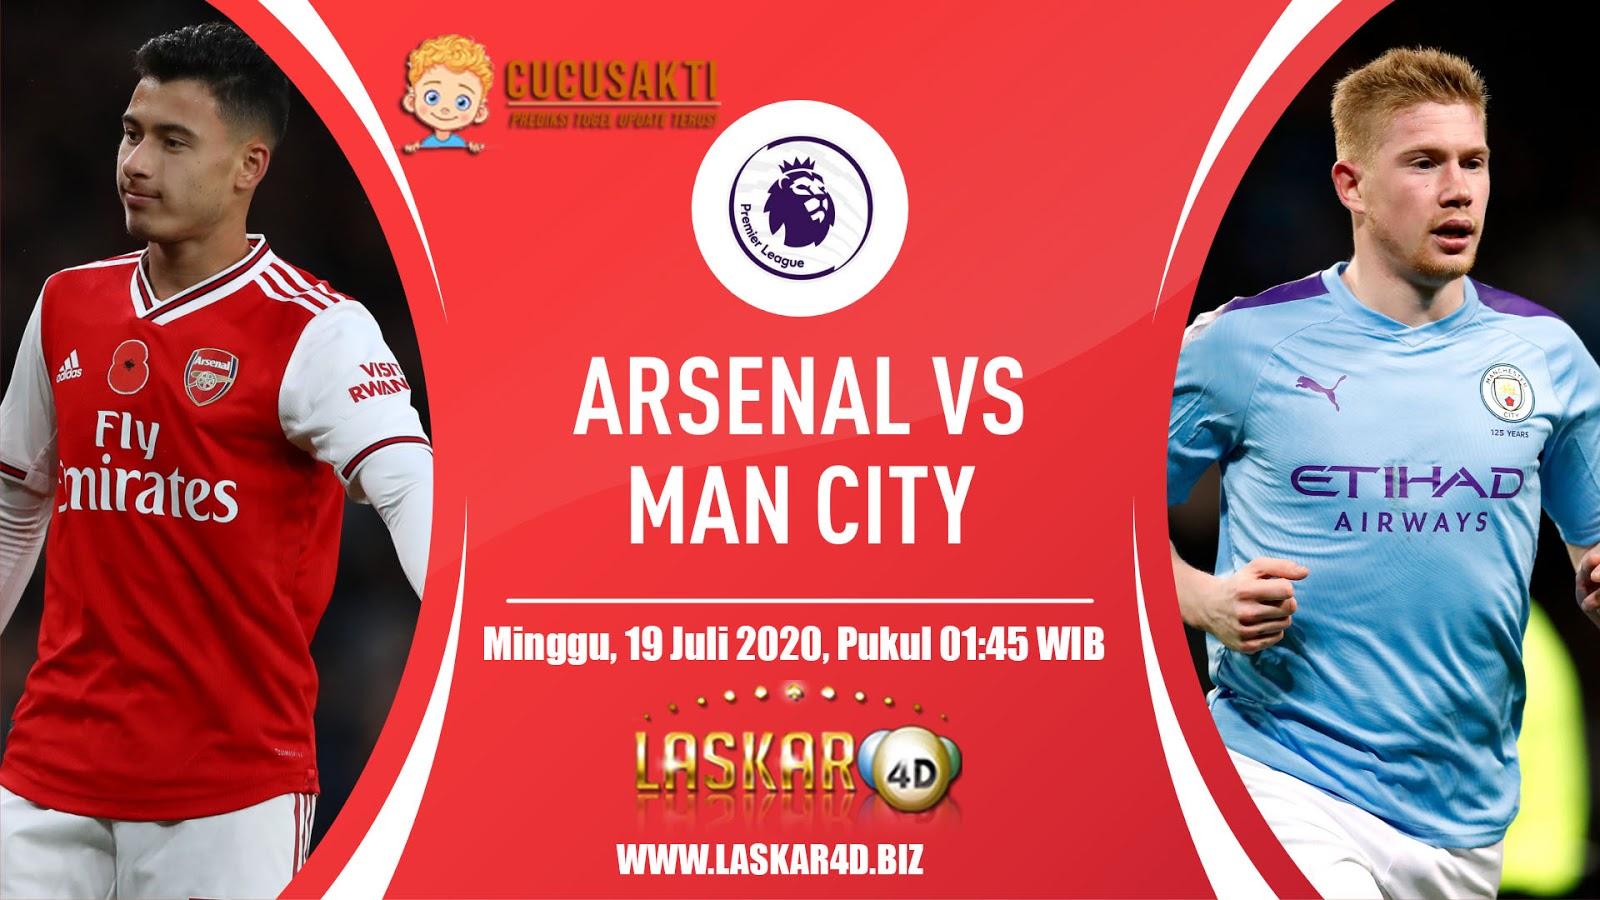 Prediksi Bola Arsenal vs Manchester City MInggu, 19 Juli 2020